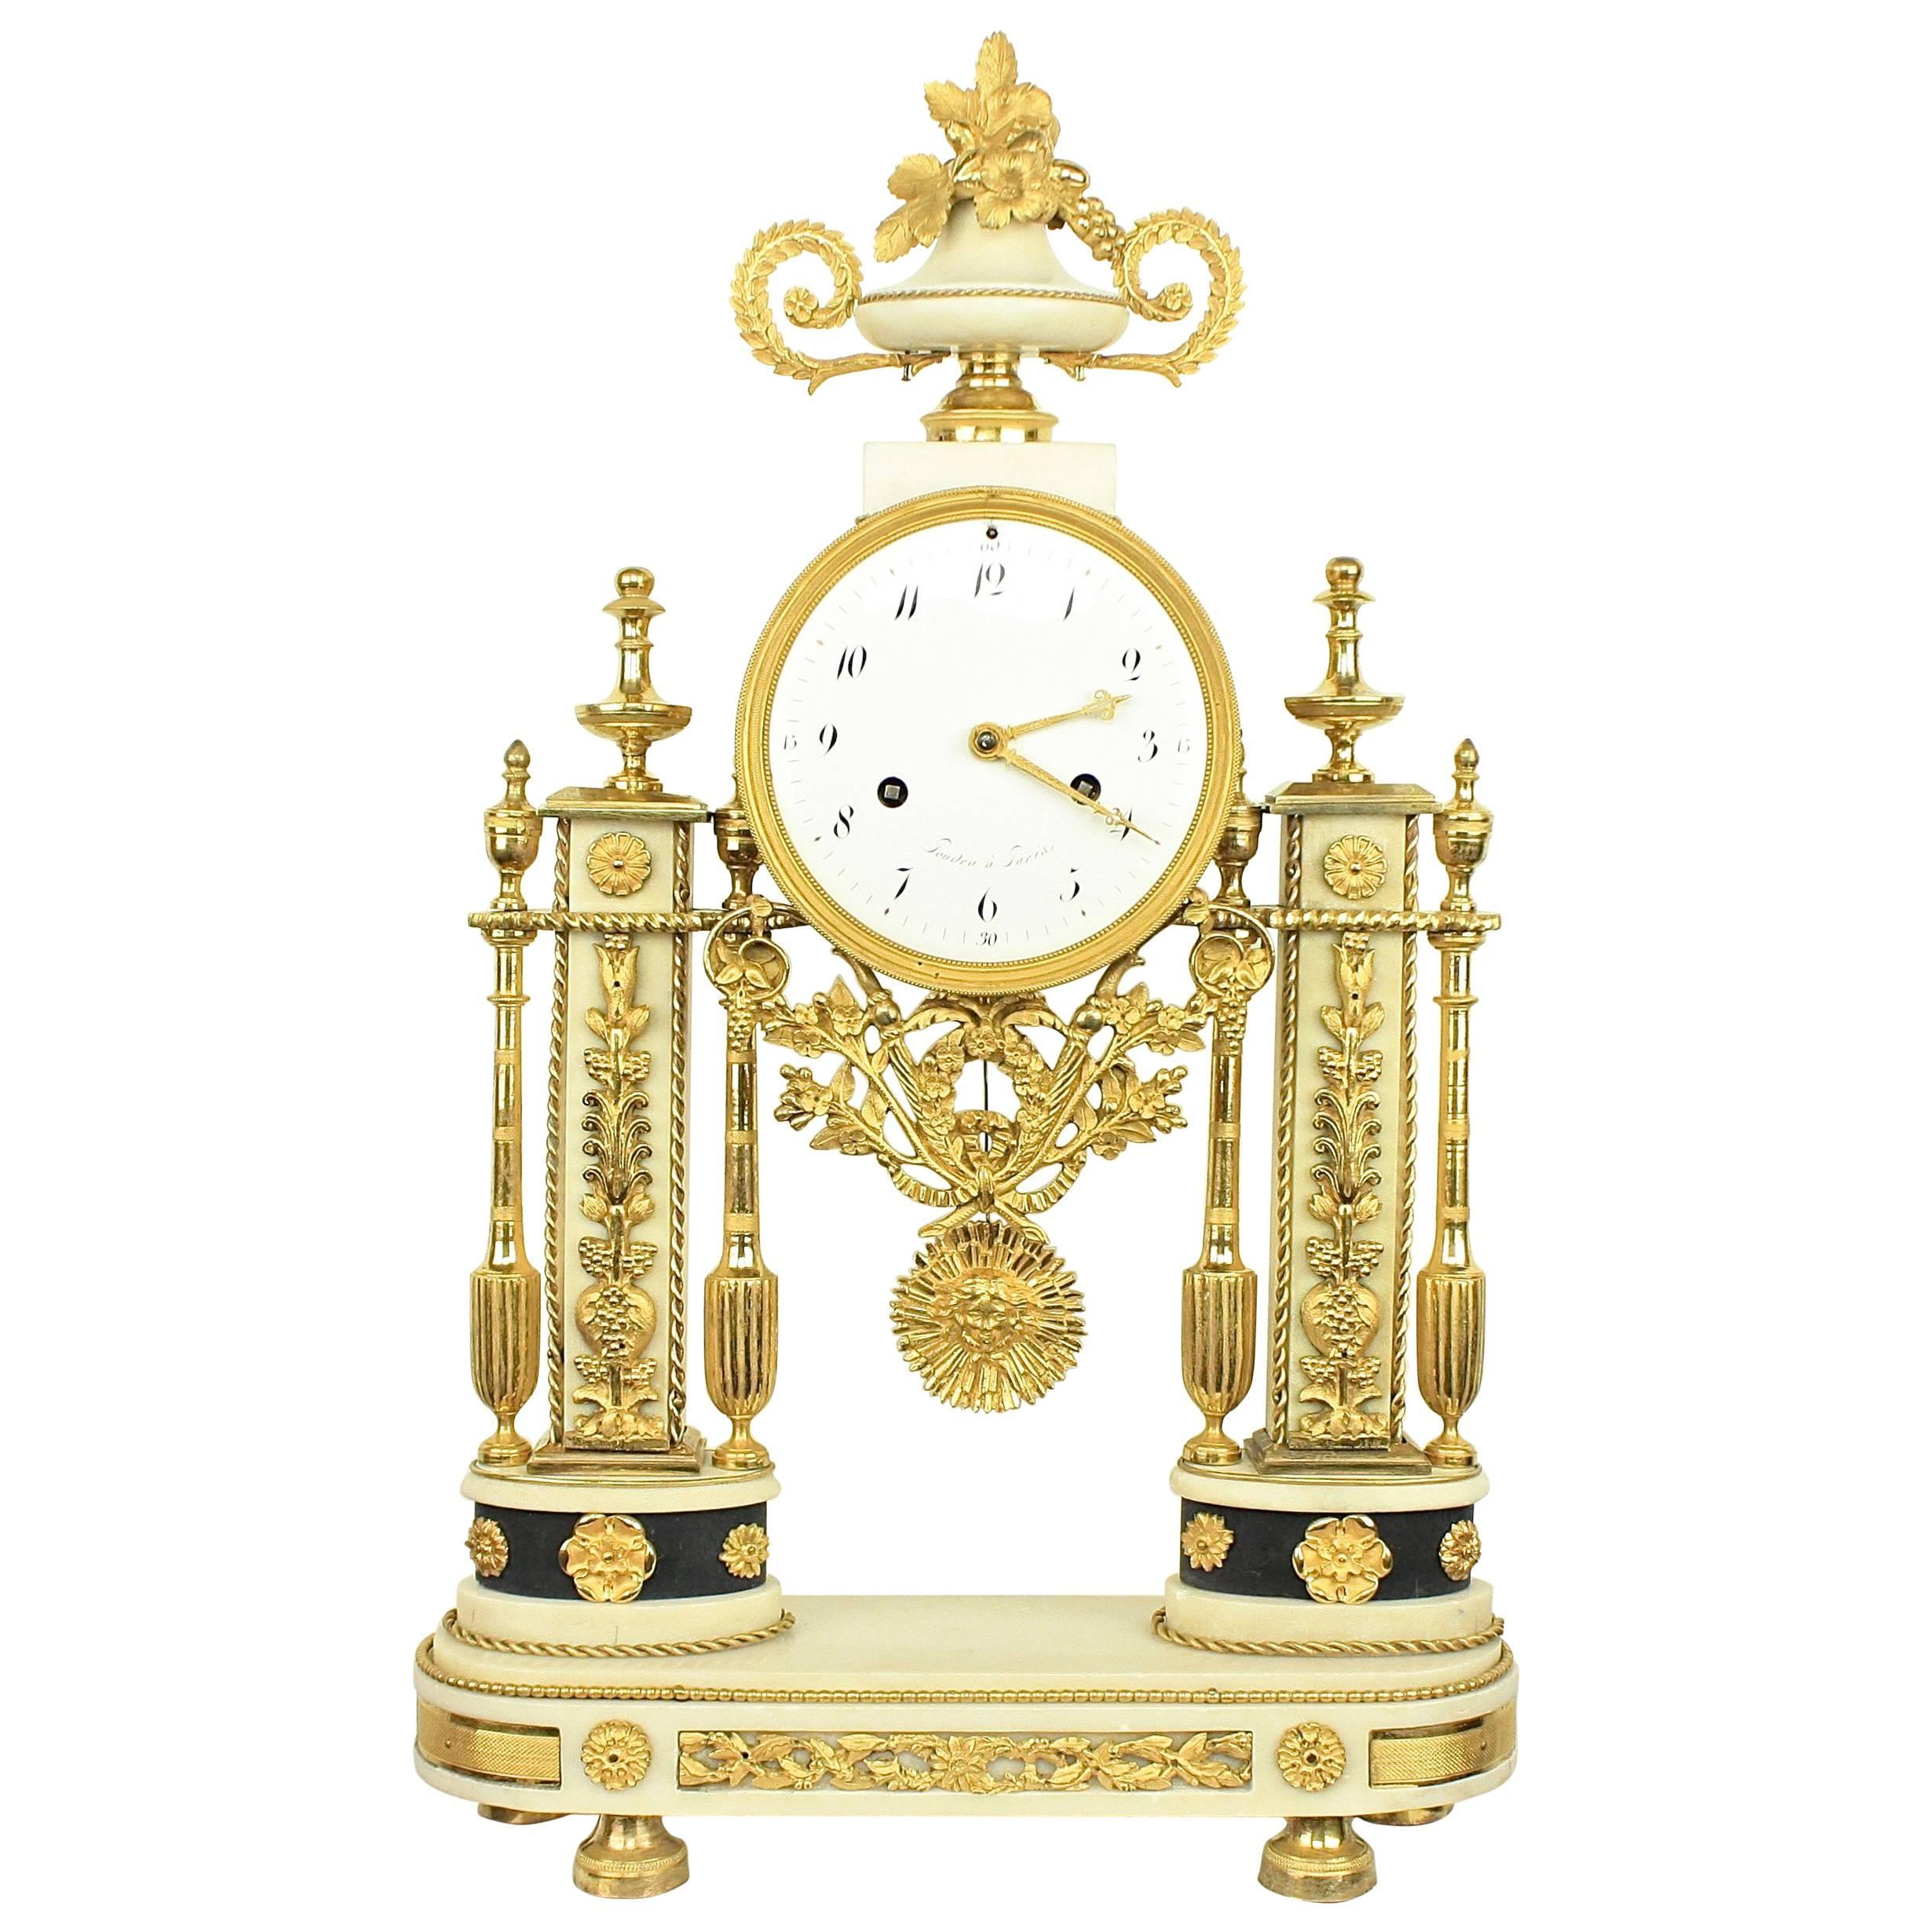 Late 18th Century Louis XVI Carrara and Black Marble Ormolu Portico Mantle Clock